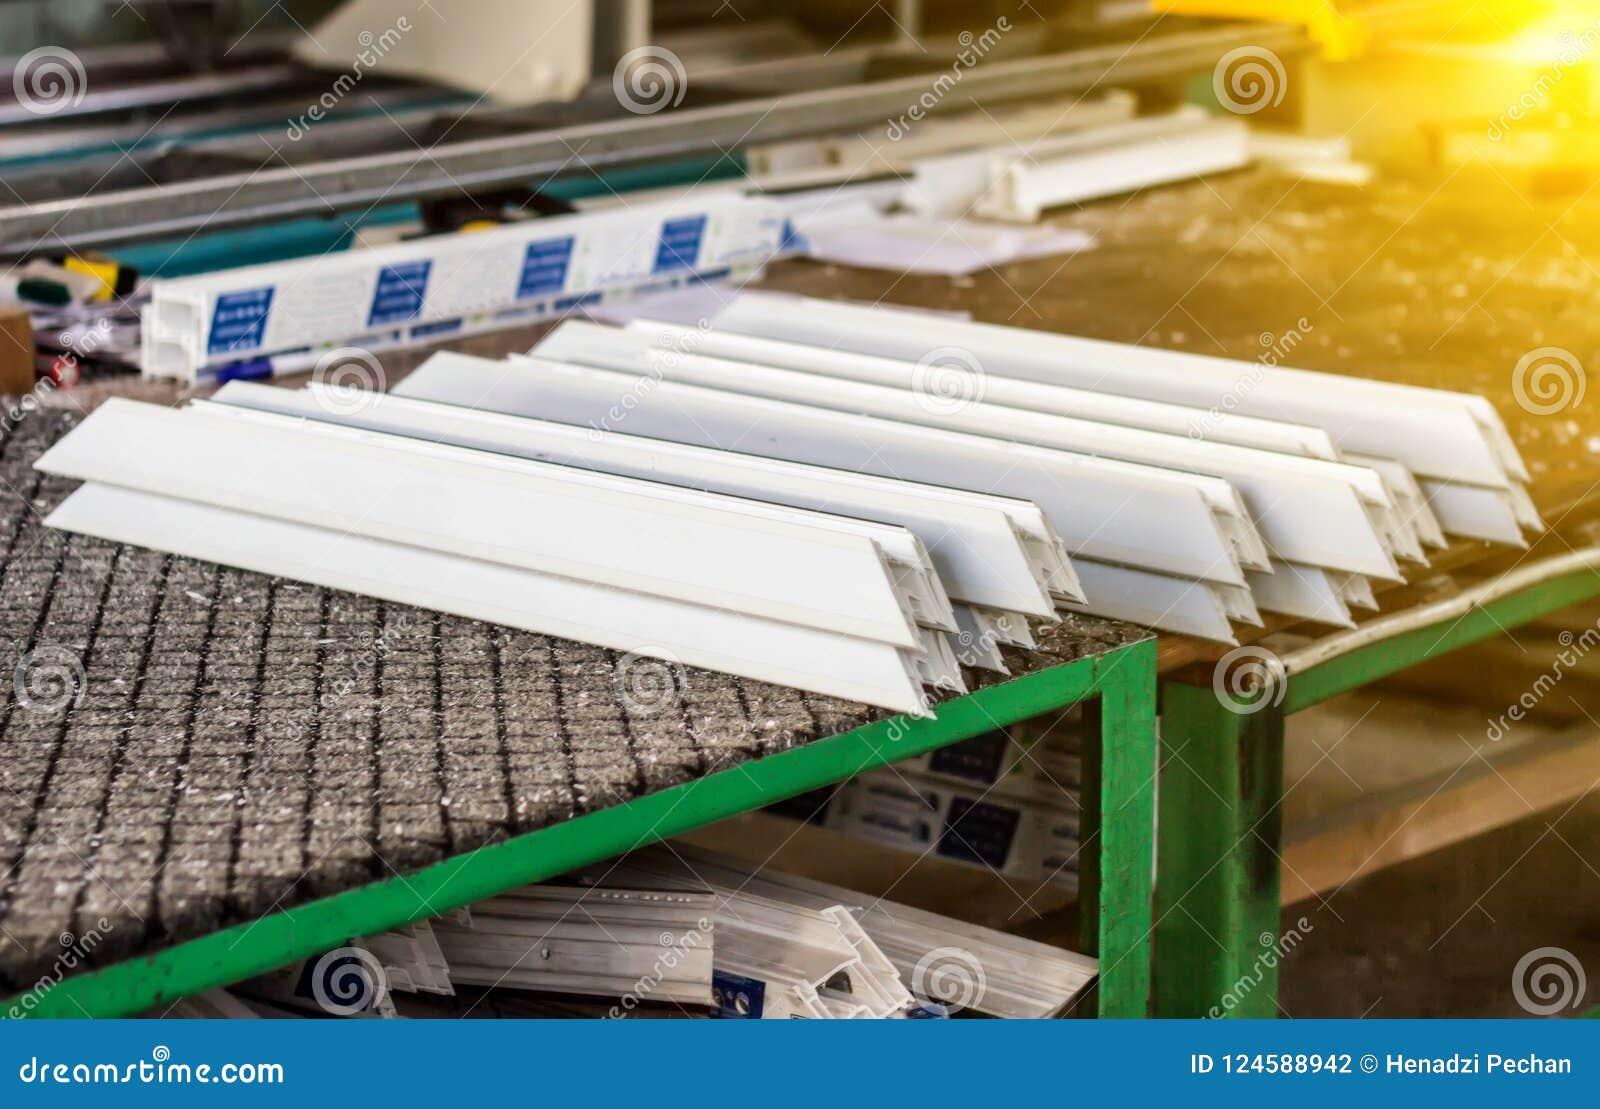 Plastic profiles for PVC windows 46